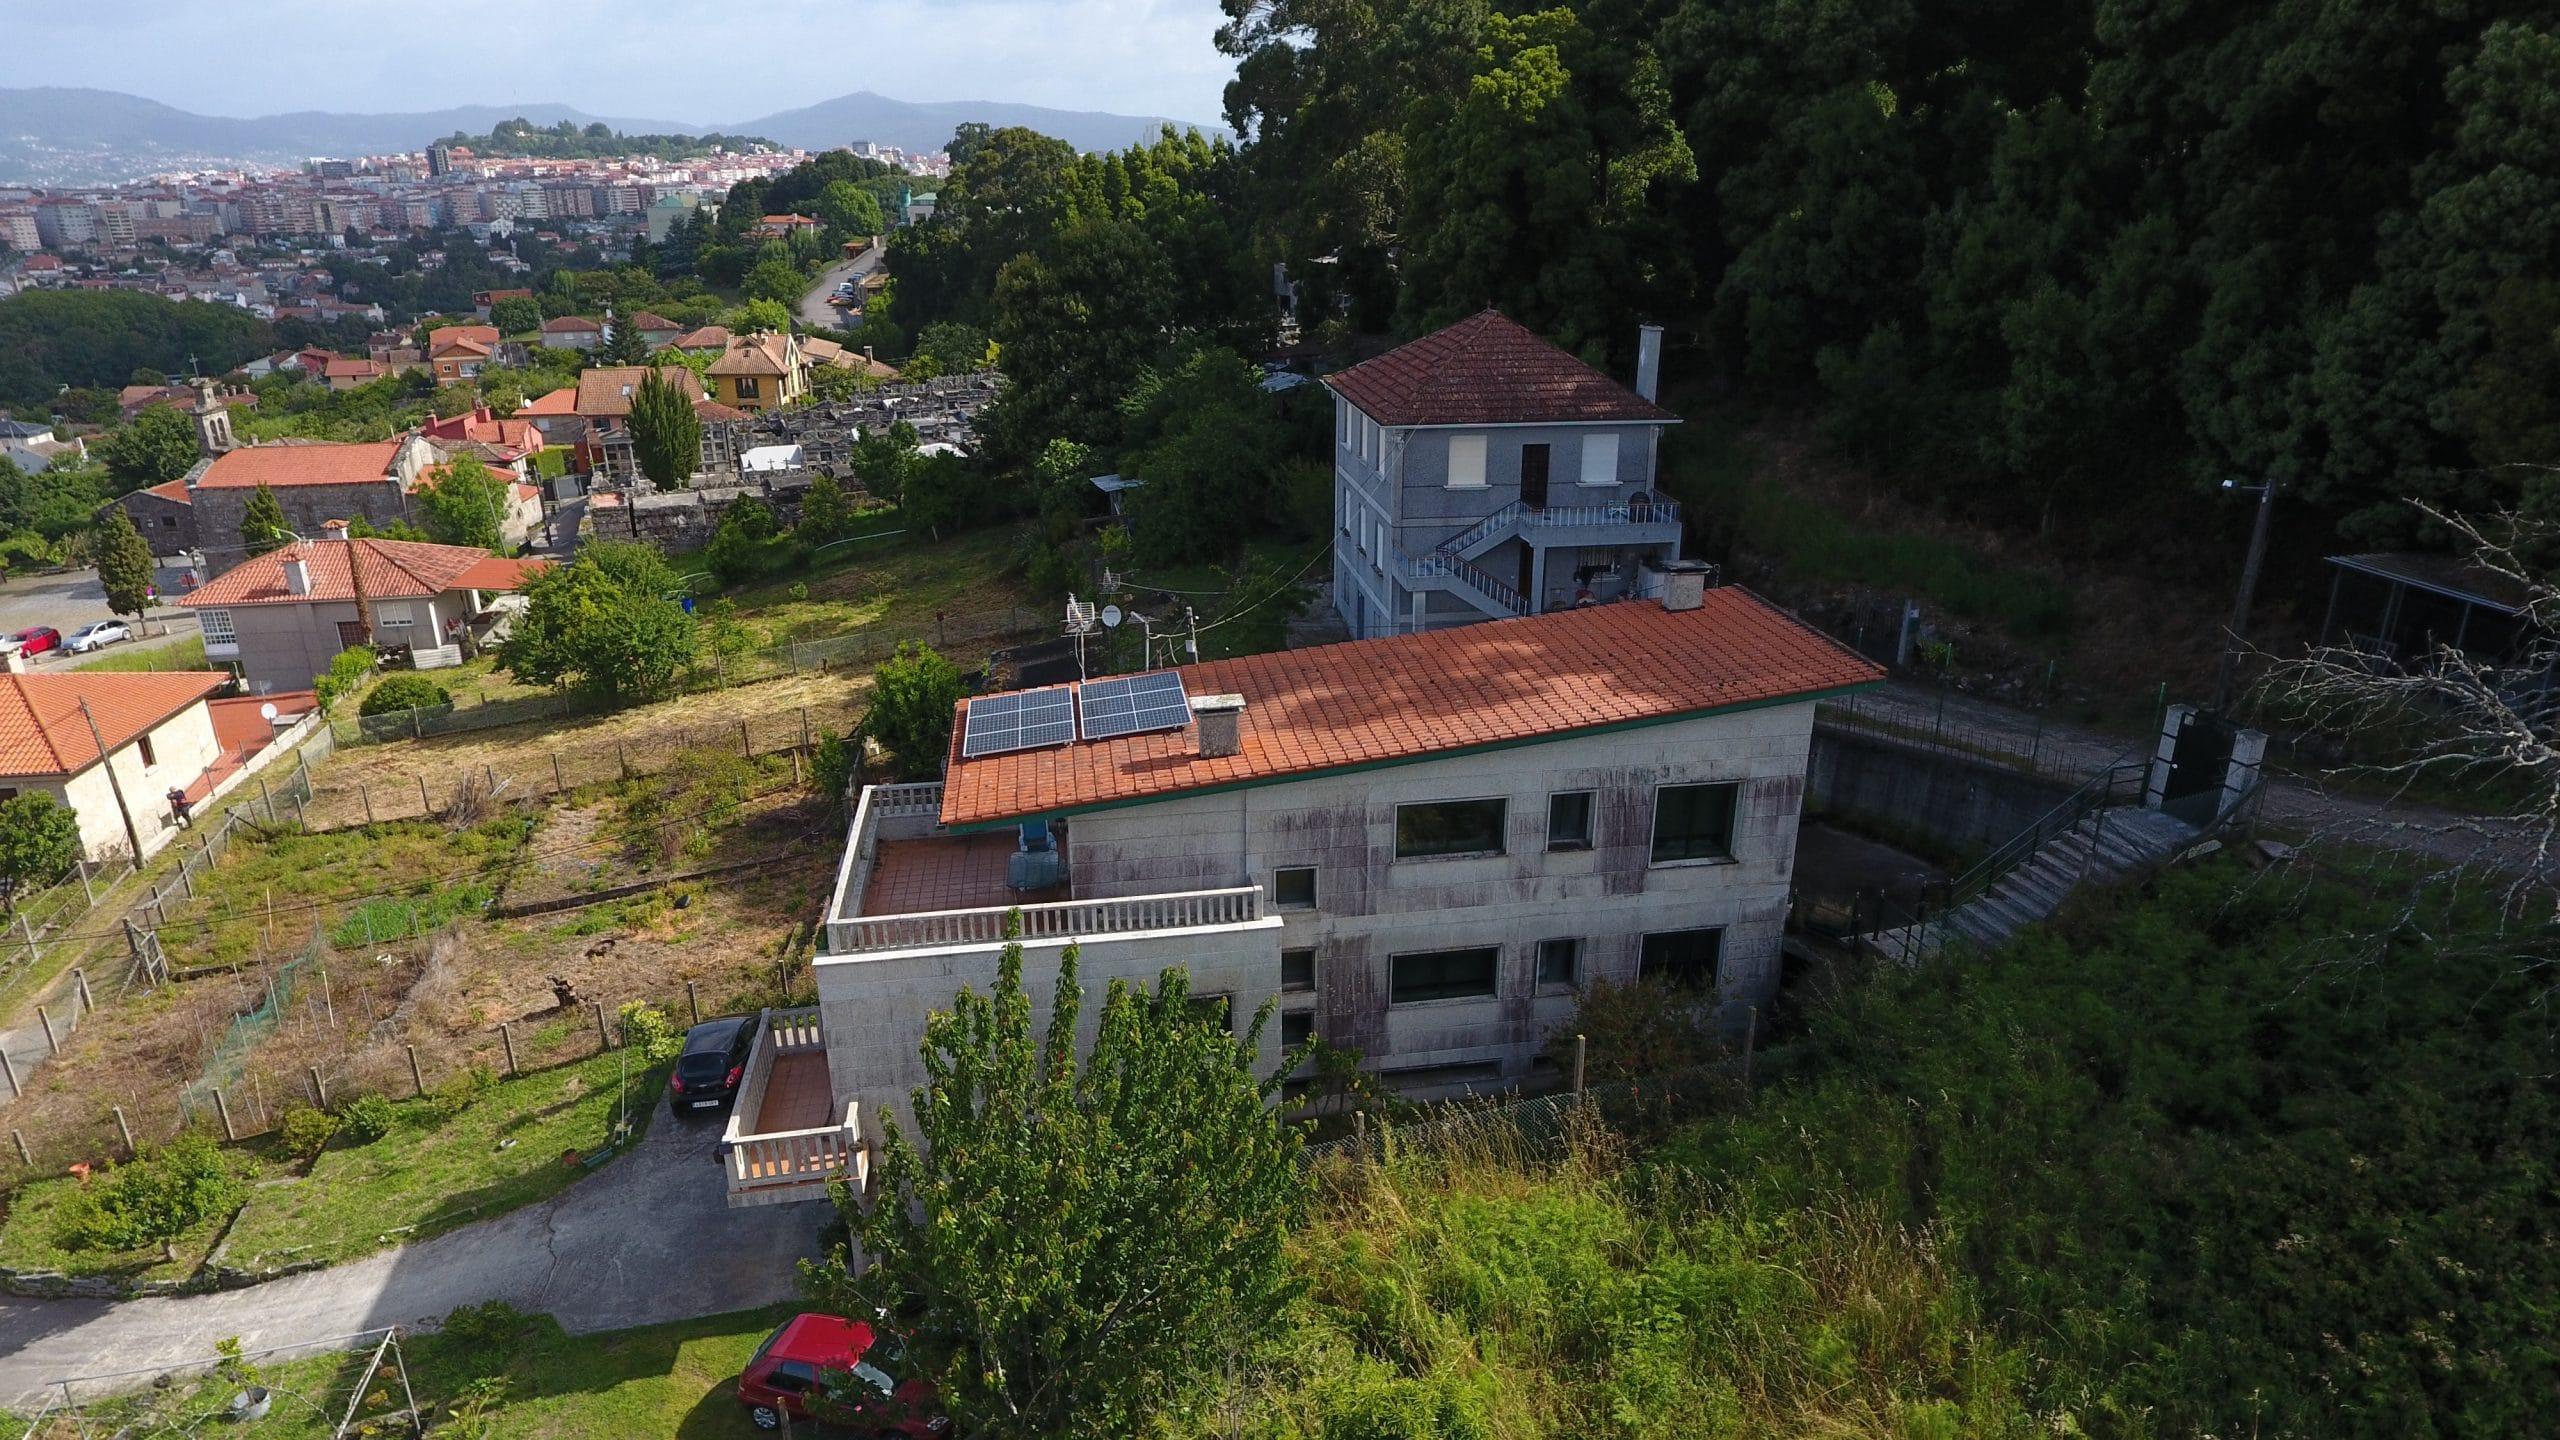 Fotovoltaica para autoconsumo en vivienda particular